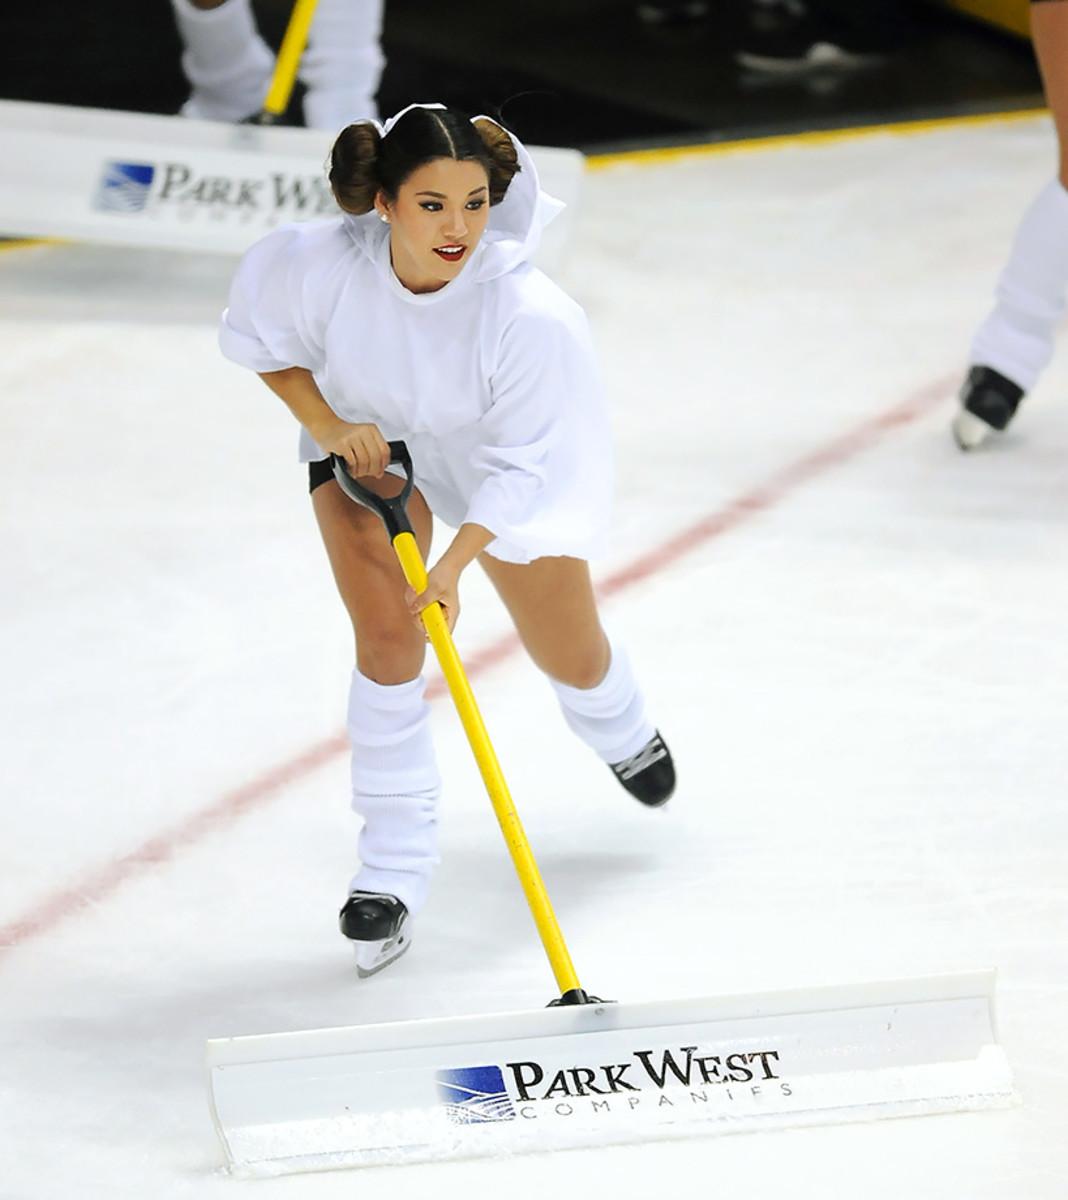 Anaheim-Ducks-Power-Players-Ice-Girls-506151130029_Lightning_at_Ducks.jpg